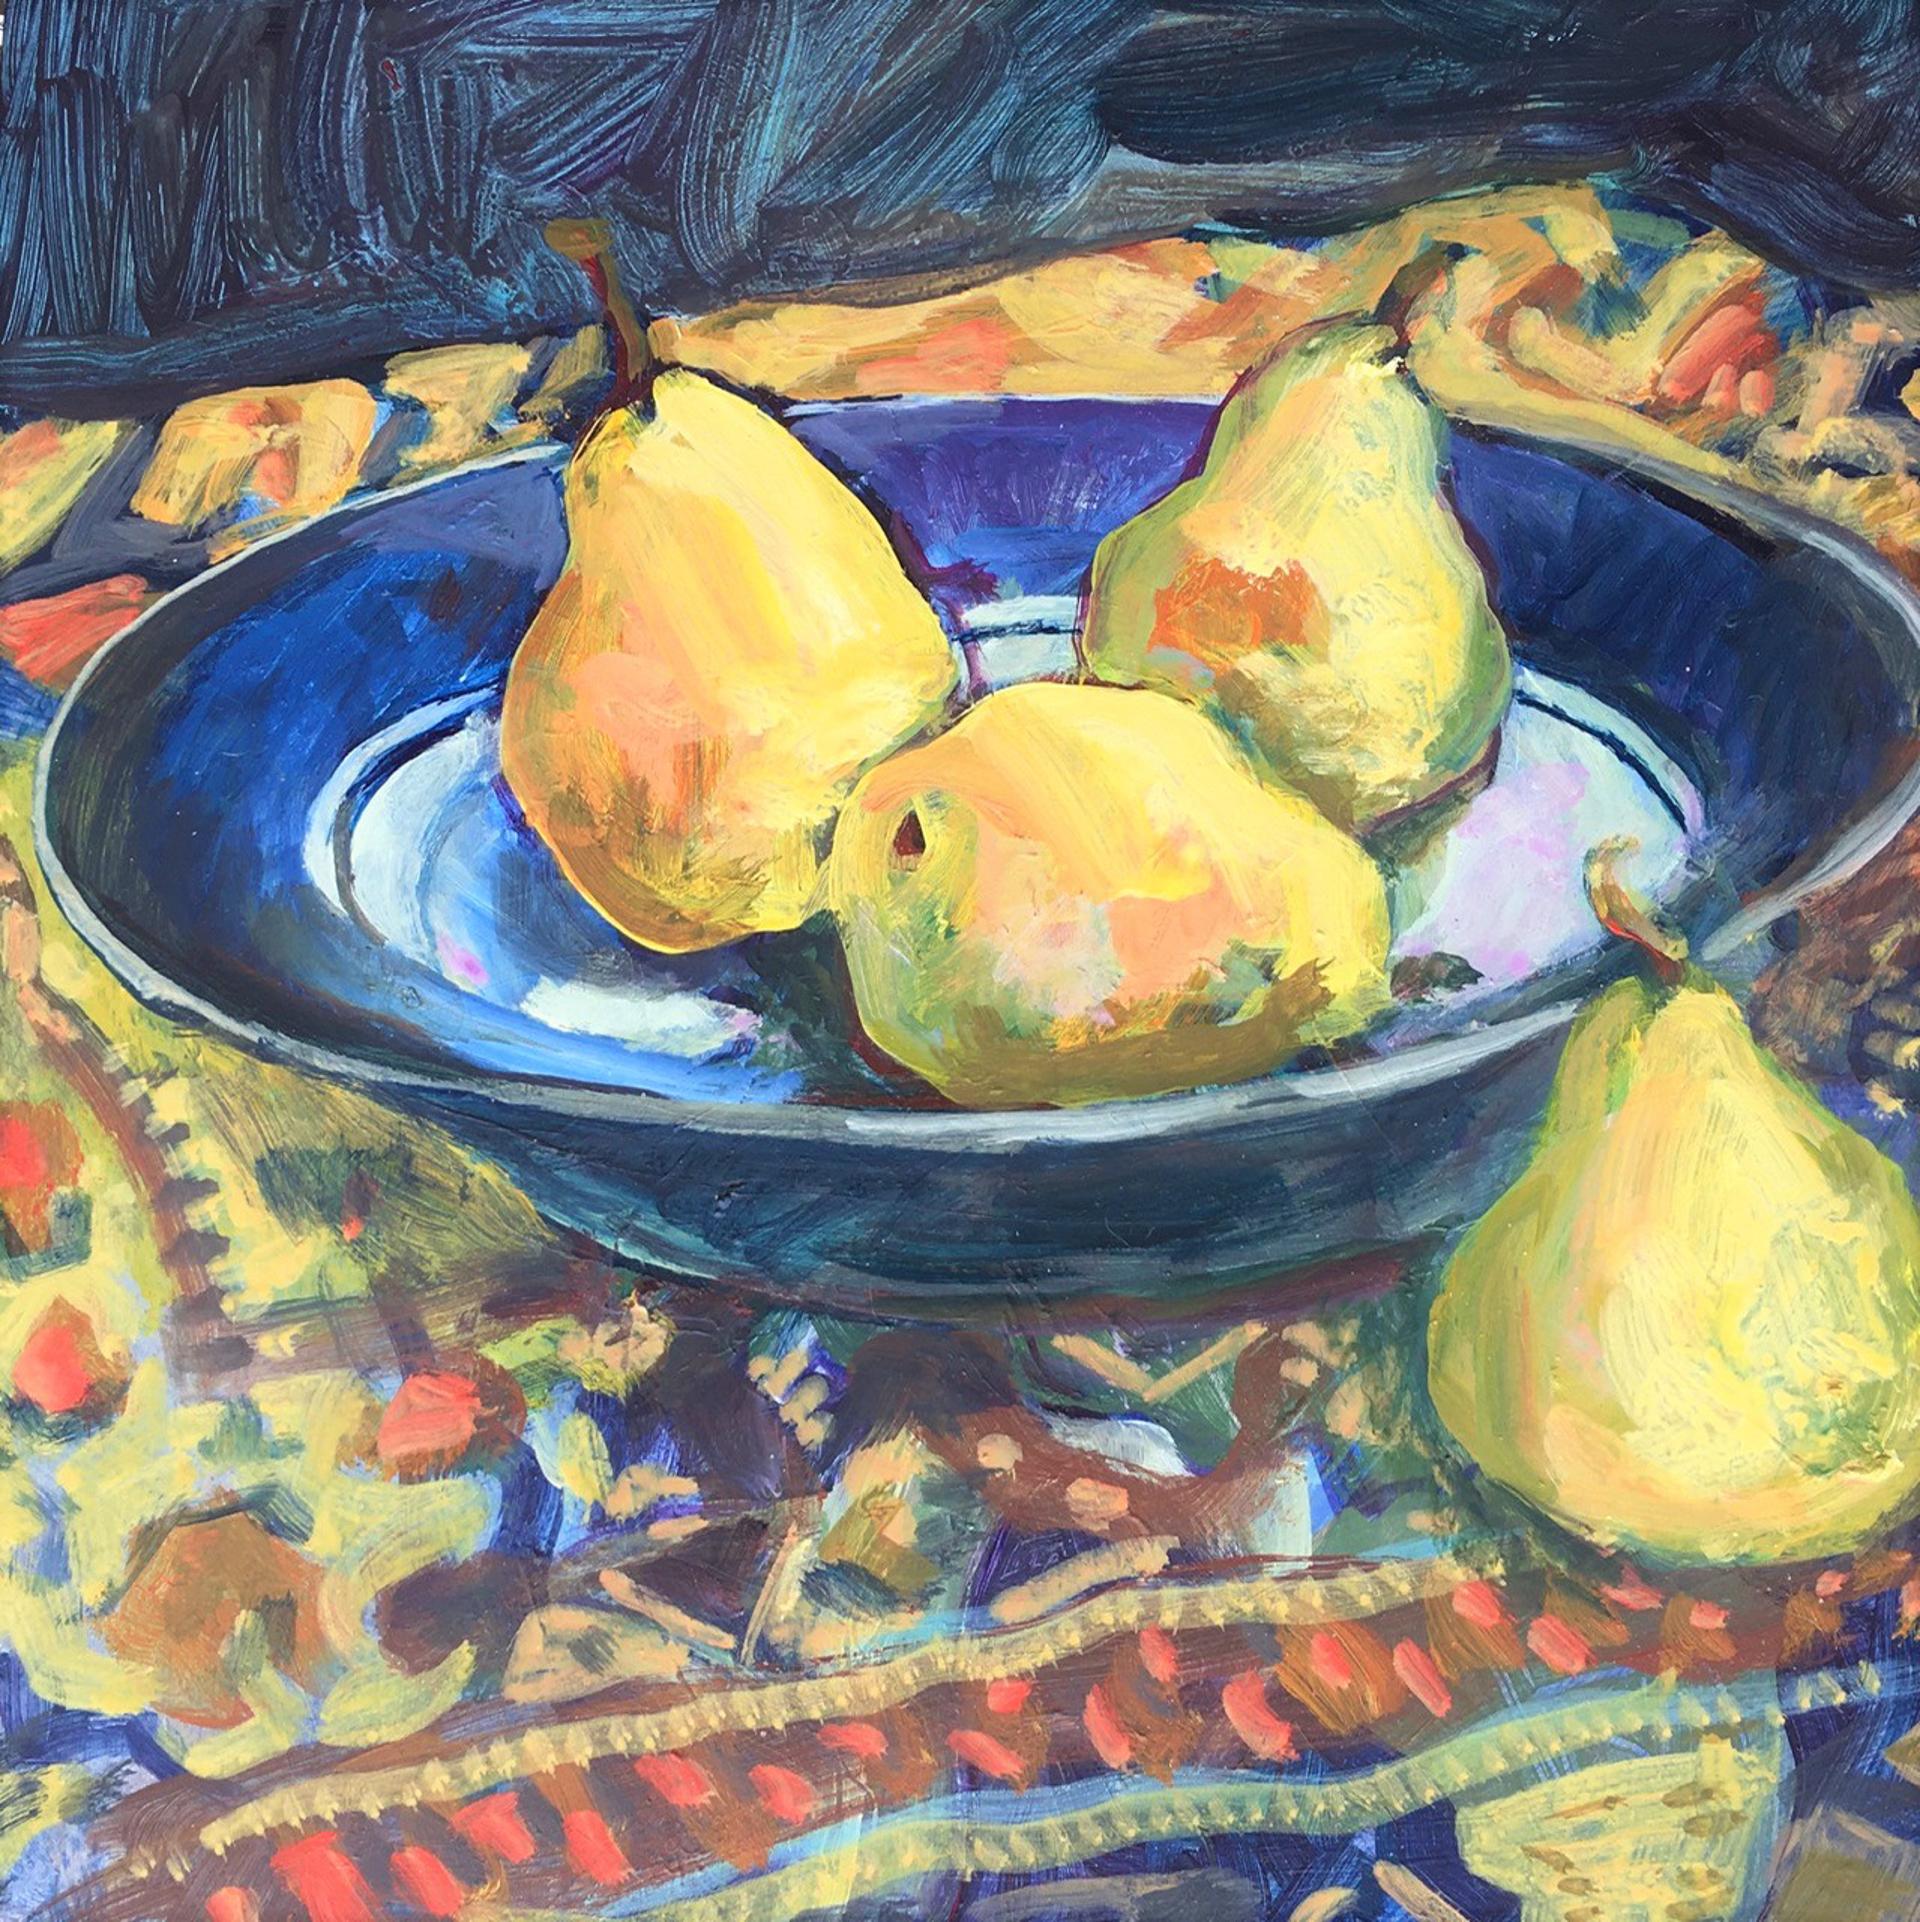 Rainy Day Pears by Nan Cunningham